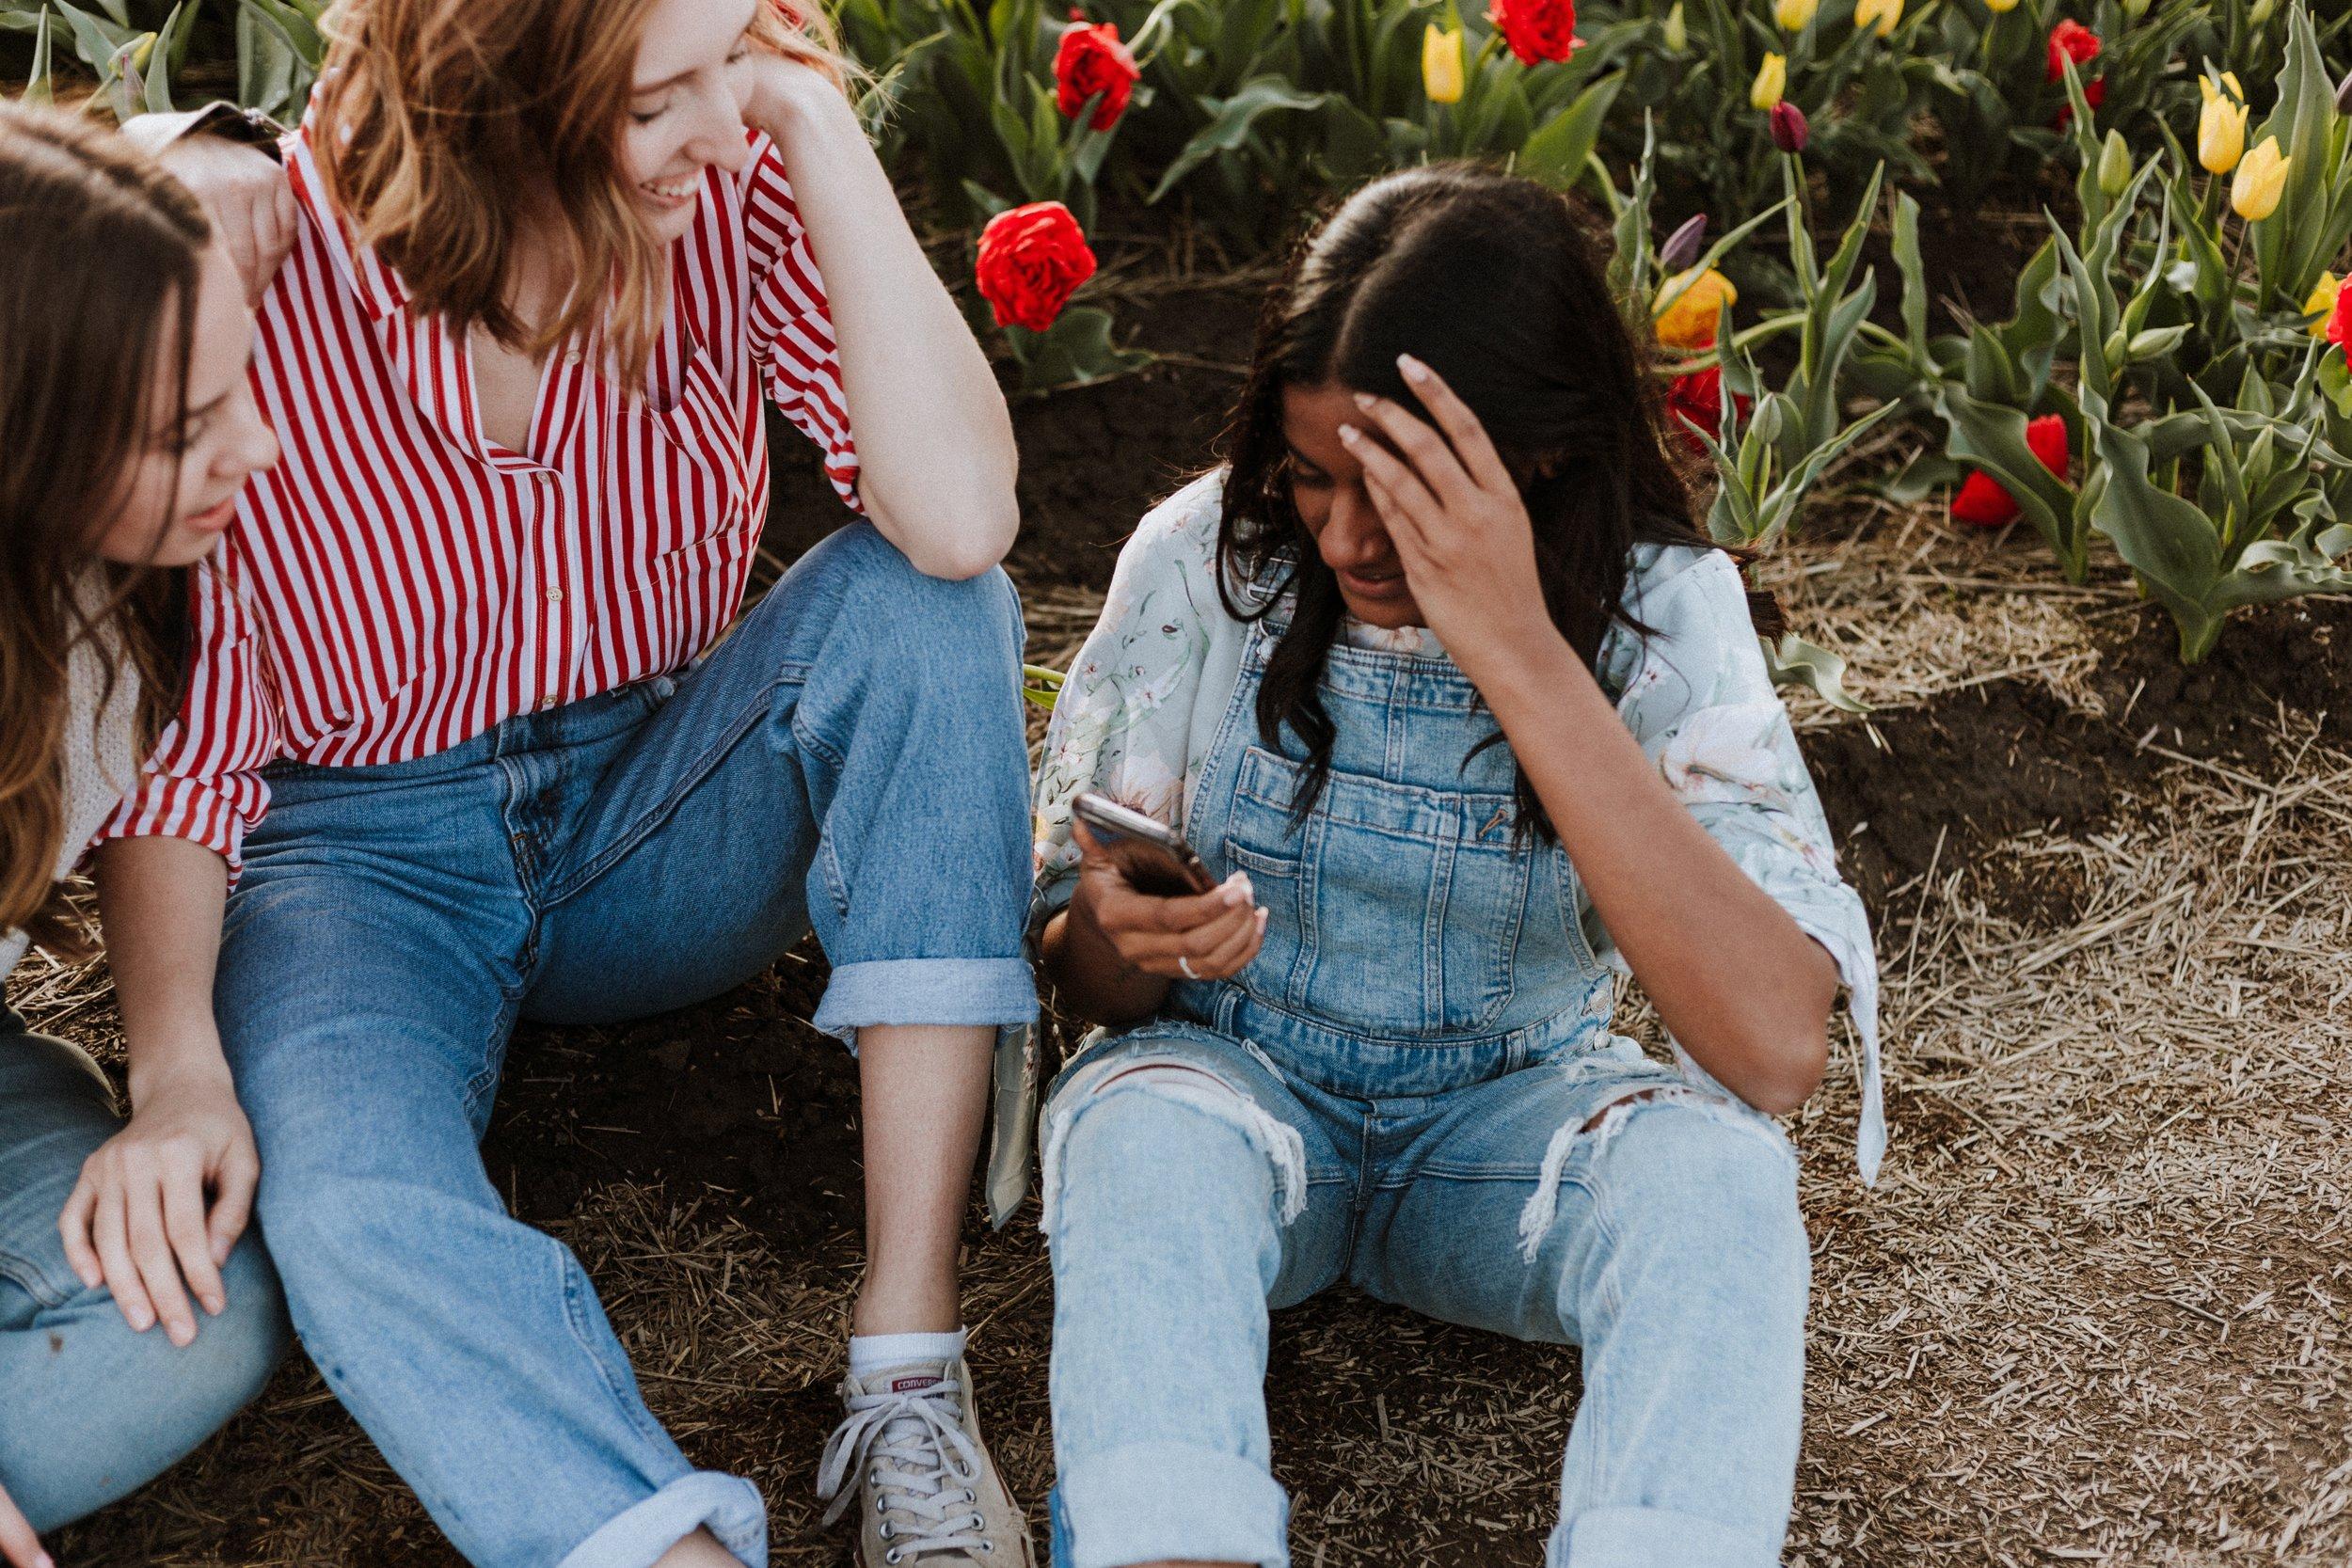 Teenagers on their phone